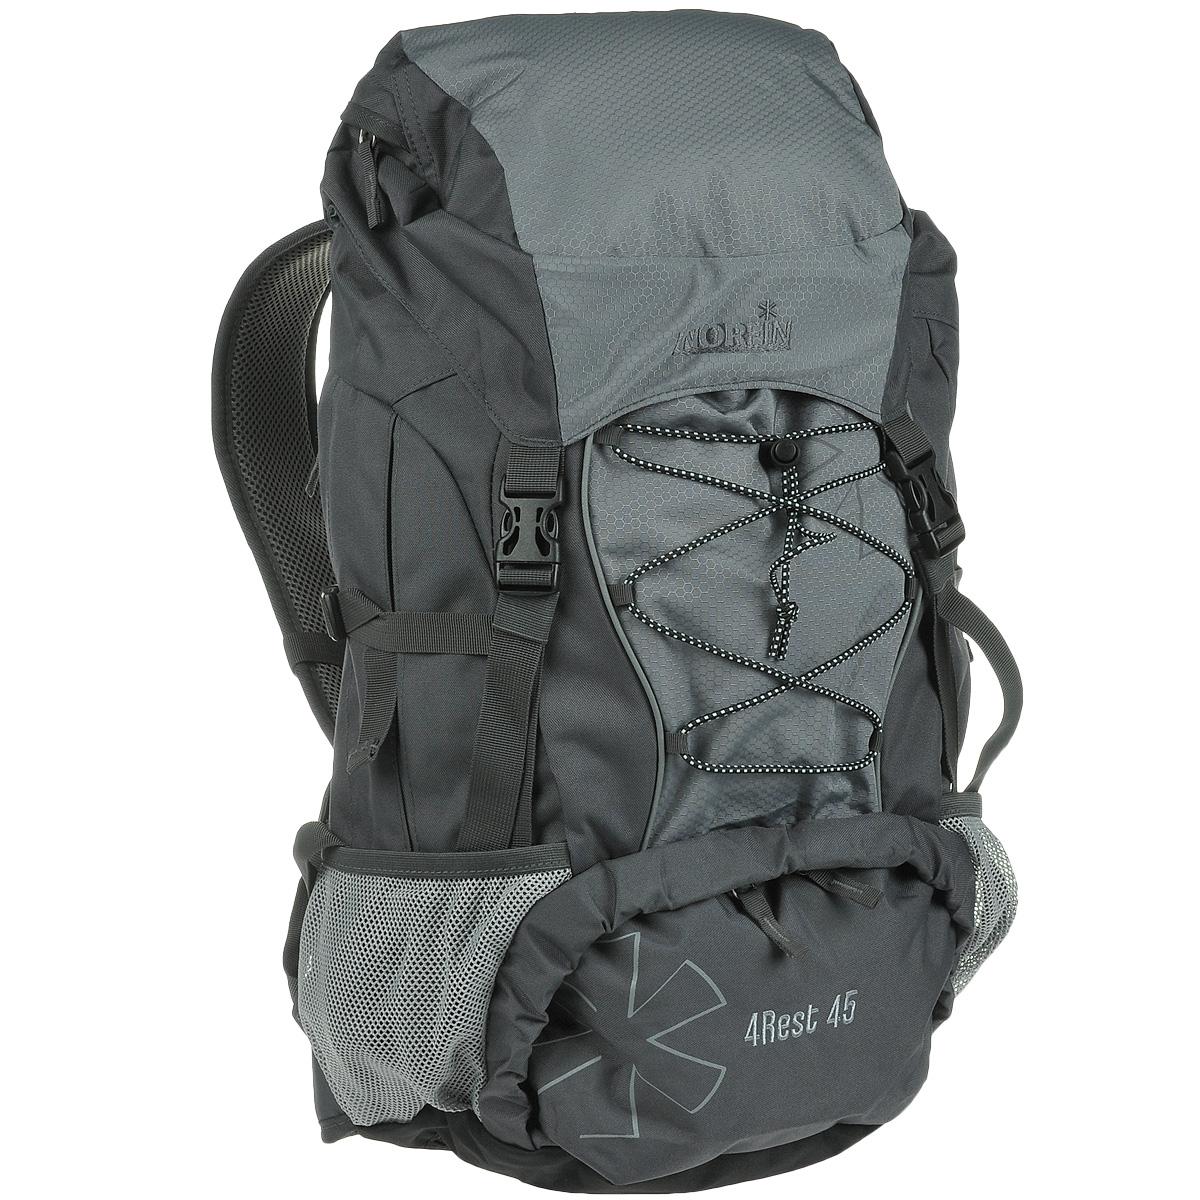 Рюкзак Norfin рюкзак norfin 4rest 50 nf